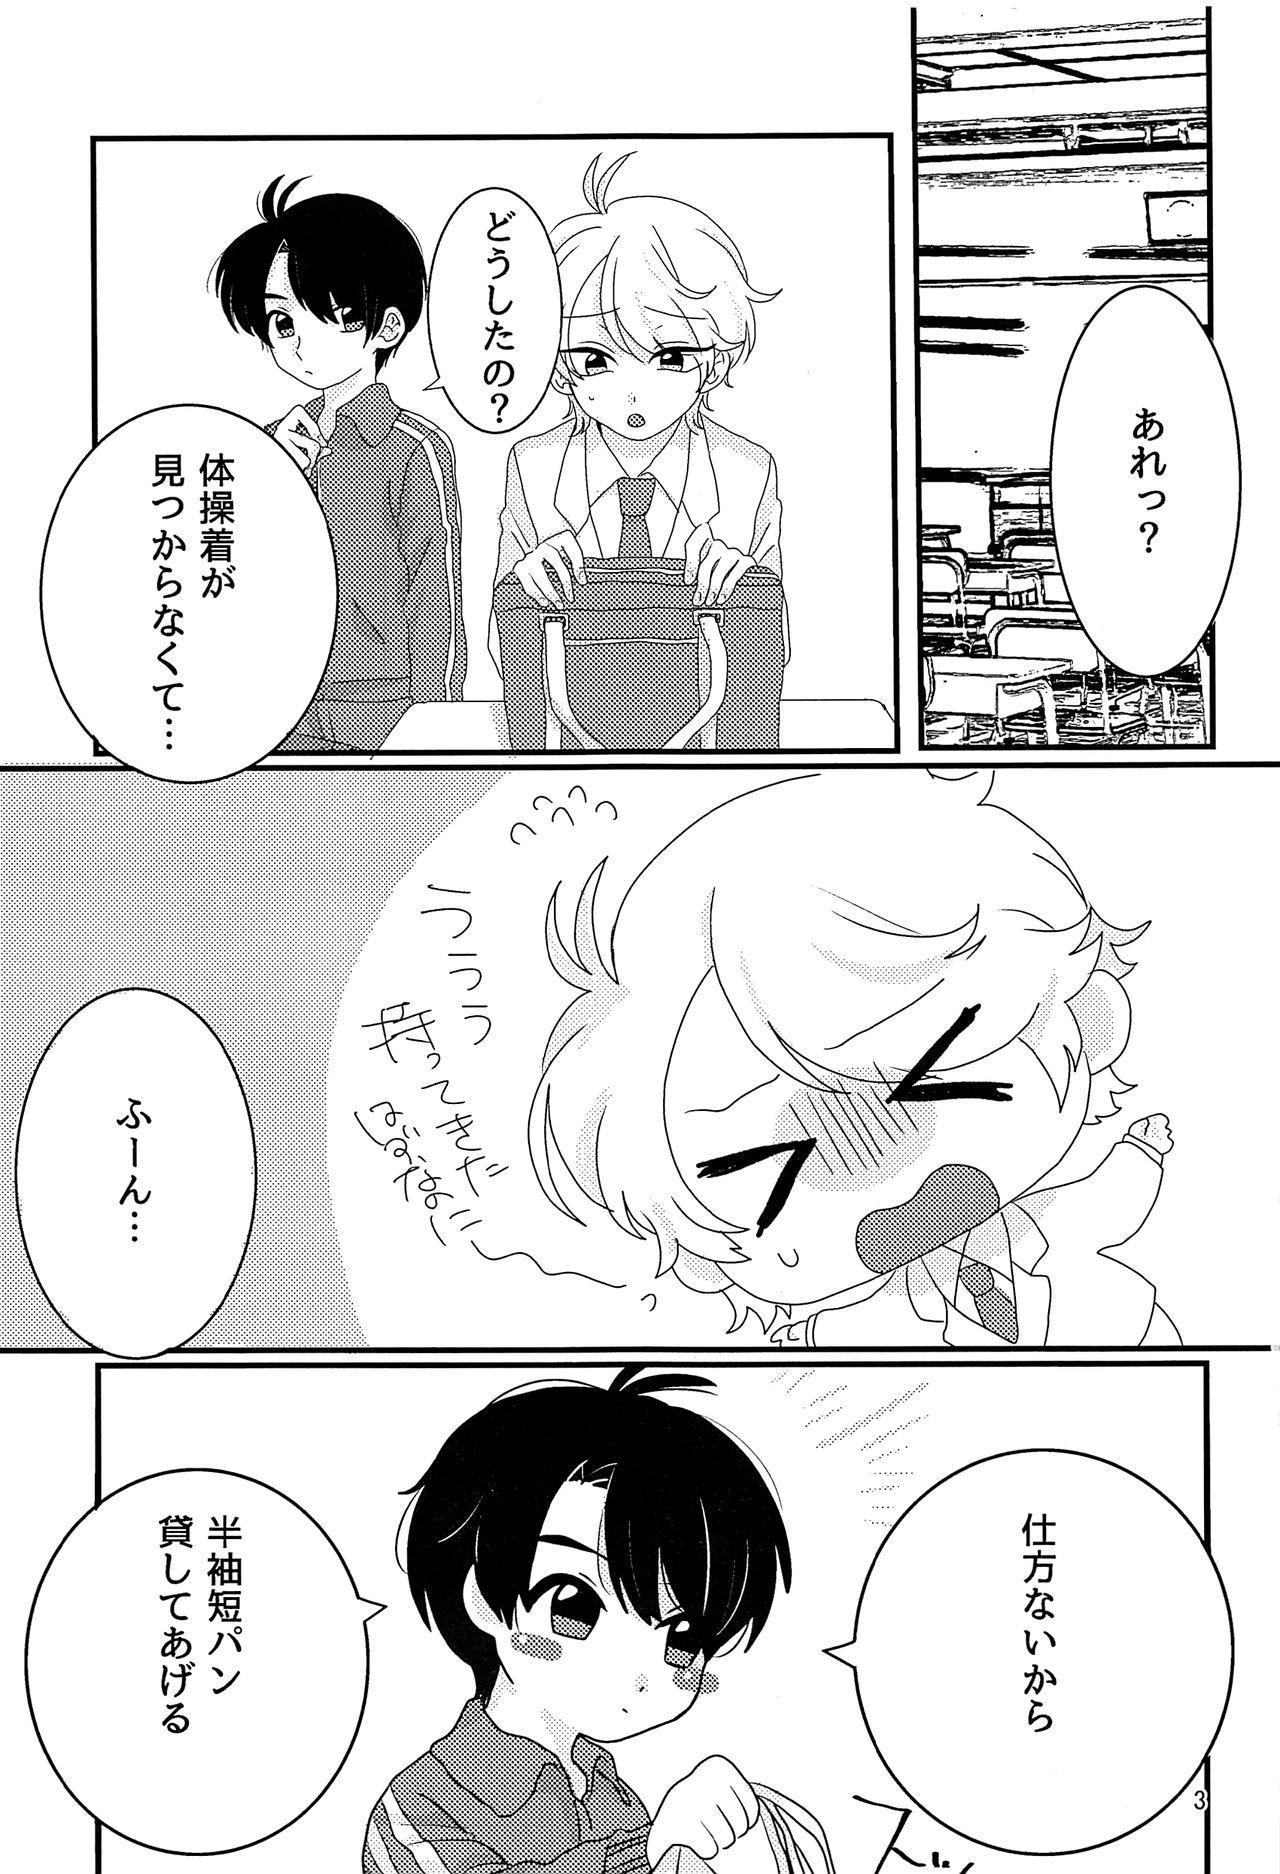 Taisougi wa ii ne. 1